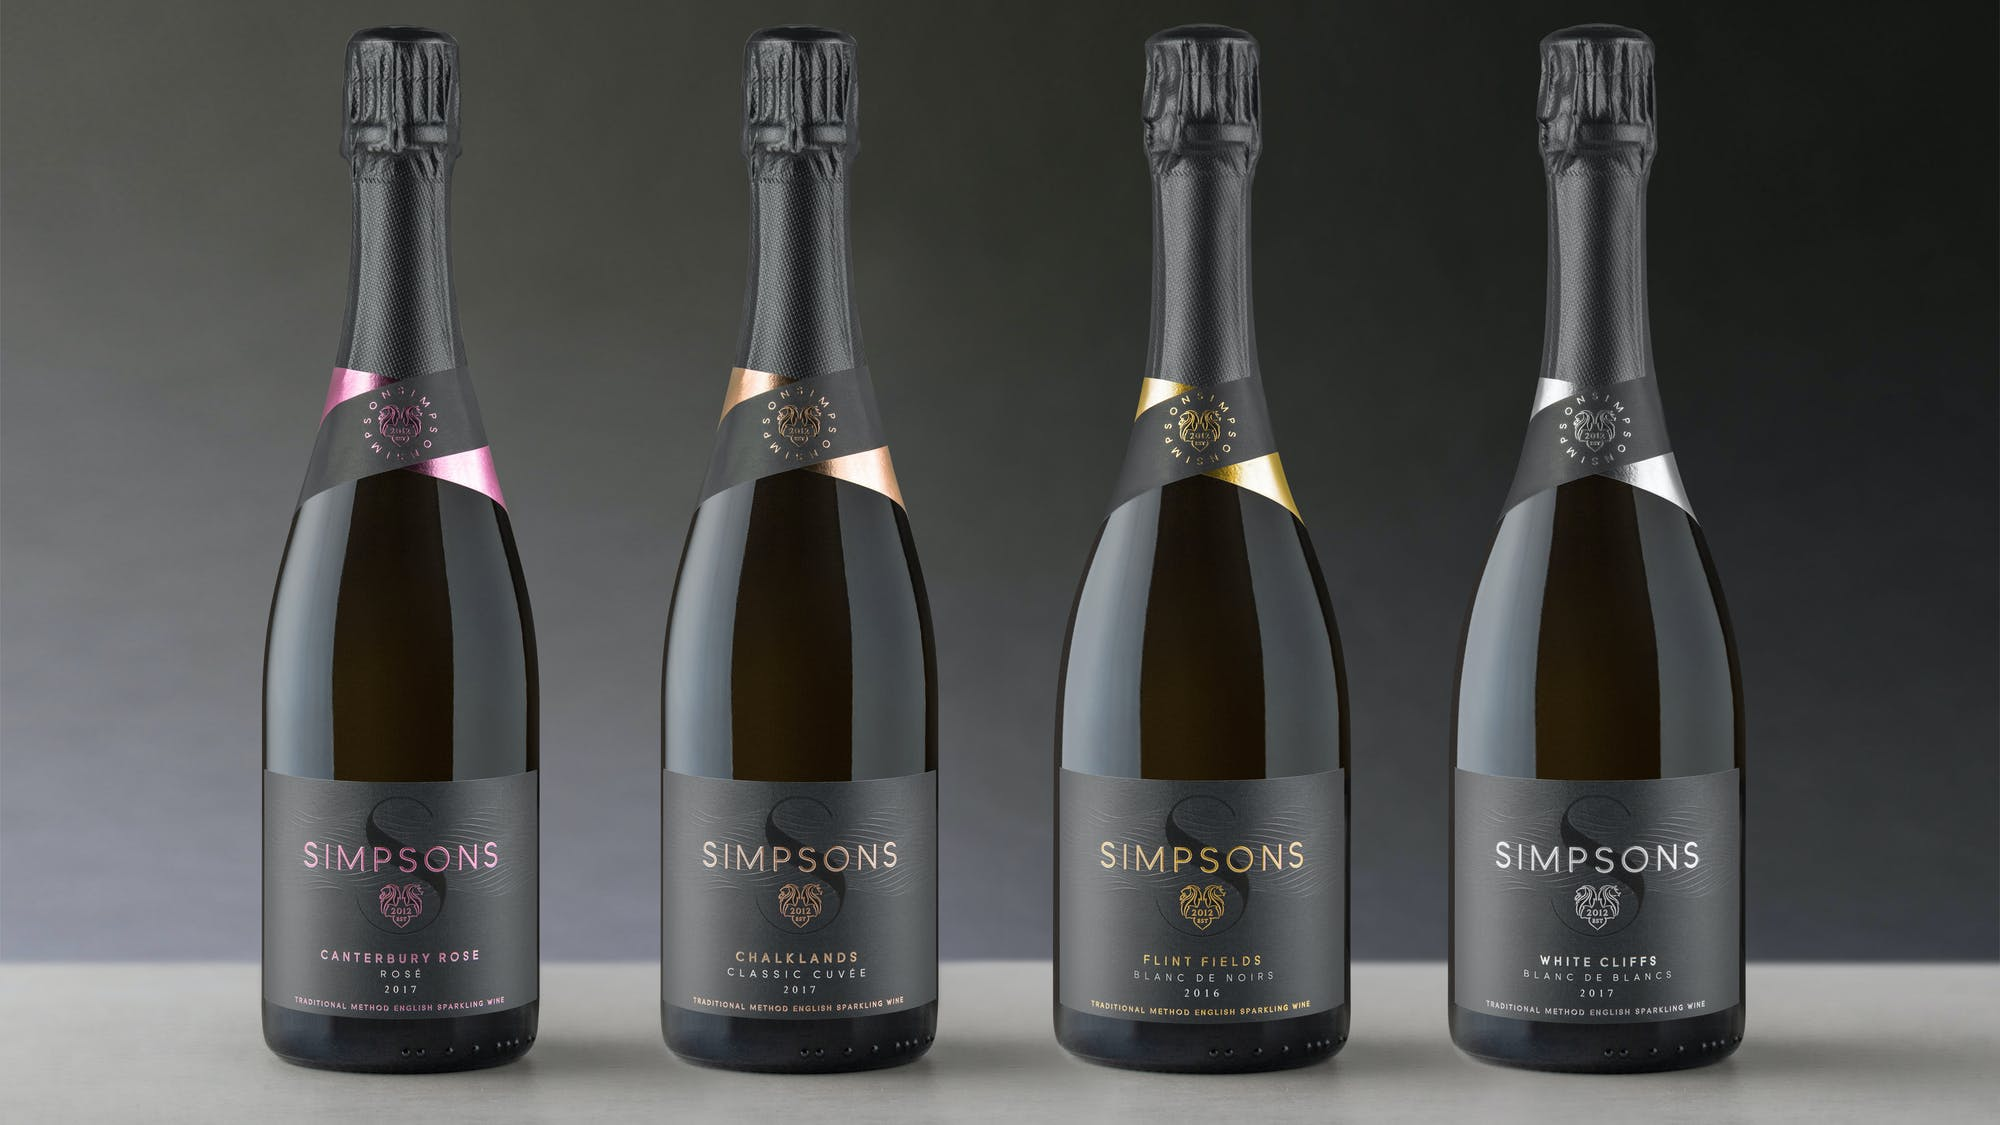 #BuyOnlineLuxury  Simpsons' Wine Estate